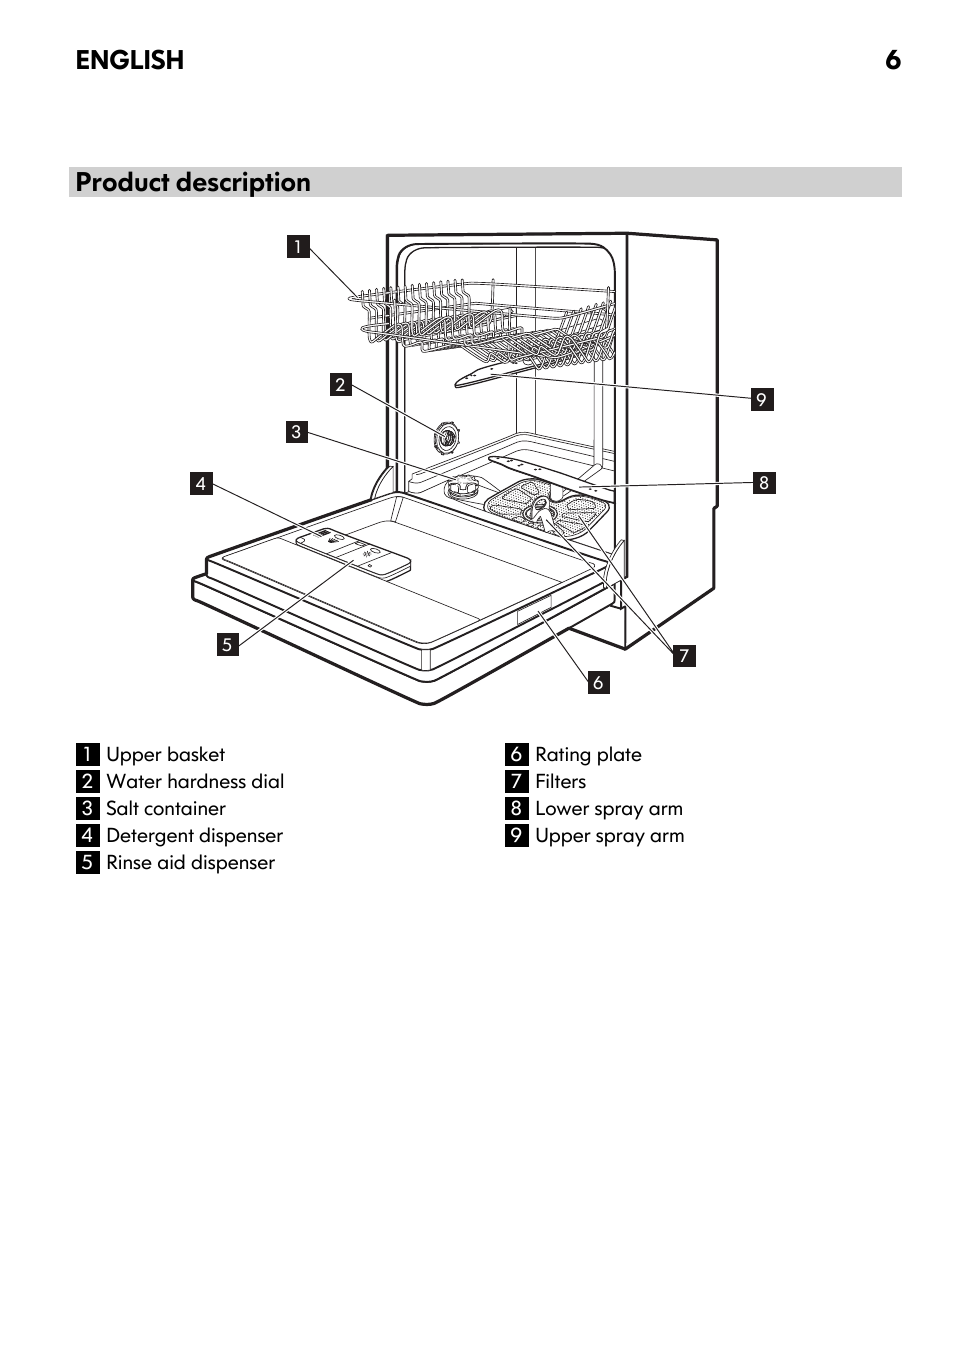 Product Description English 6 Ikea Dw60 User Manual